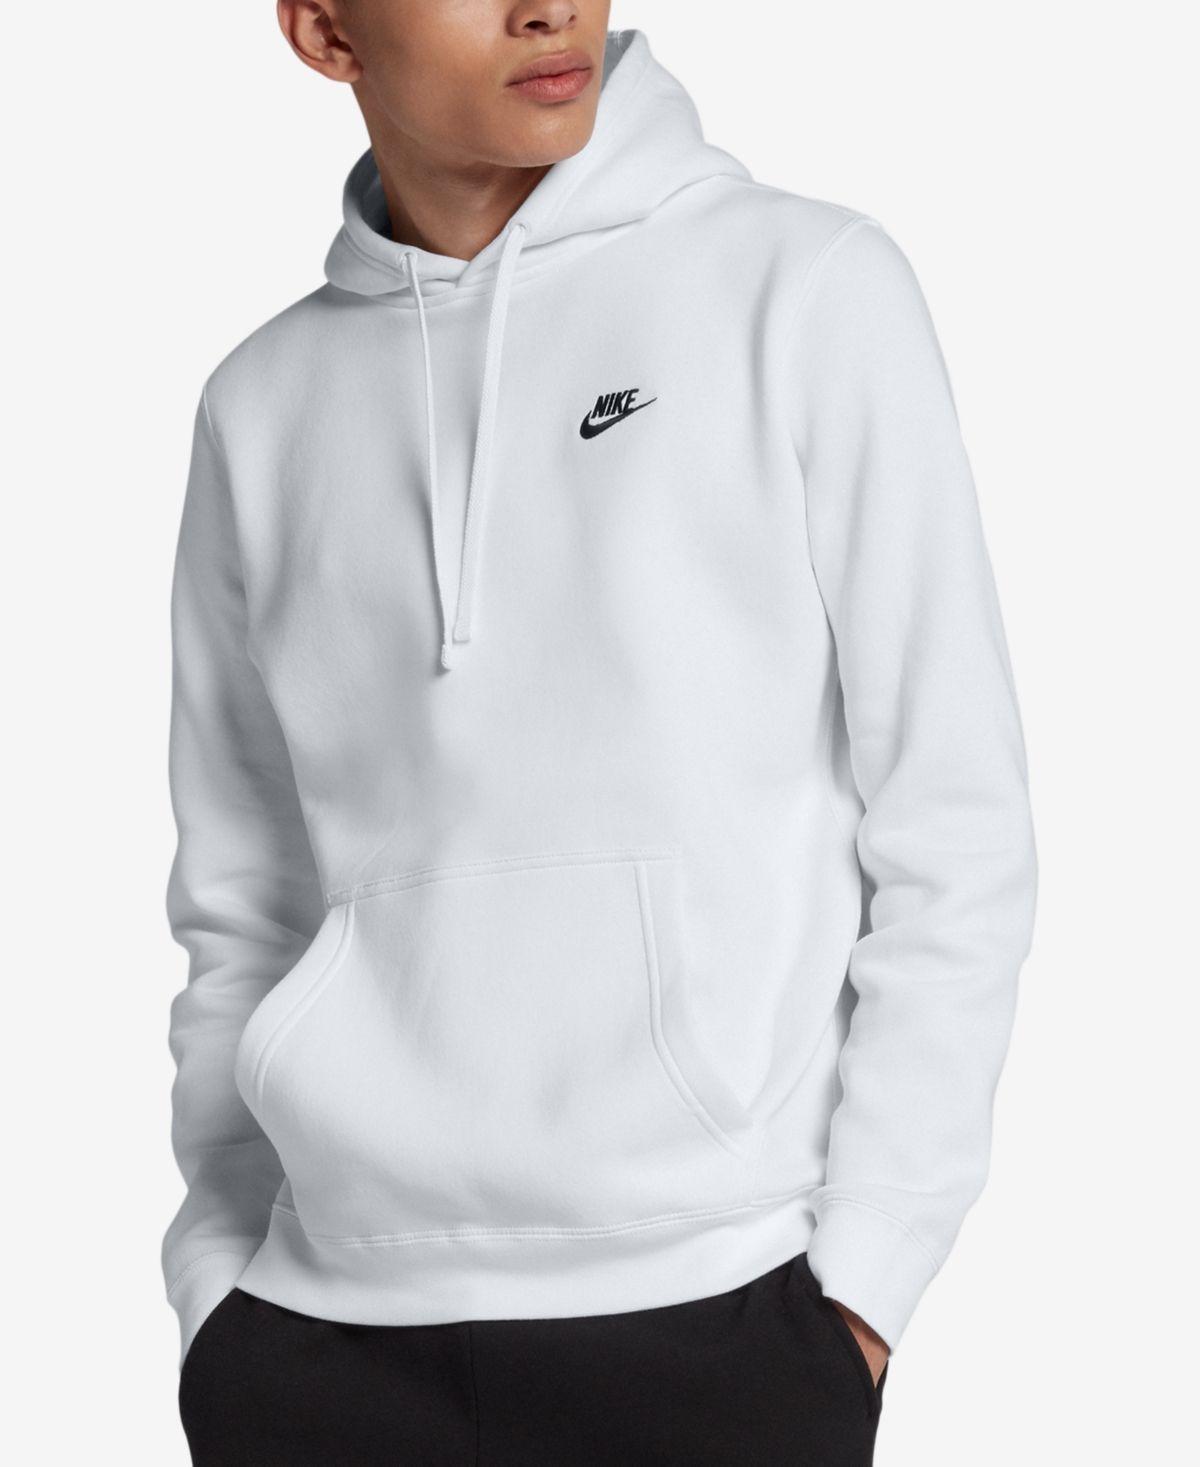 grey and white nike hoodie